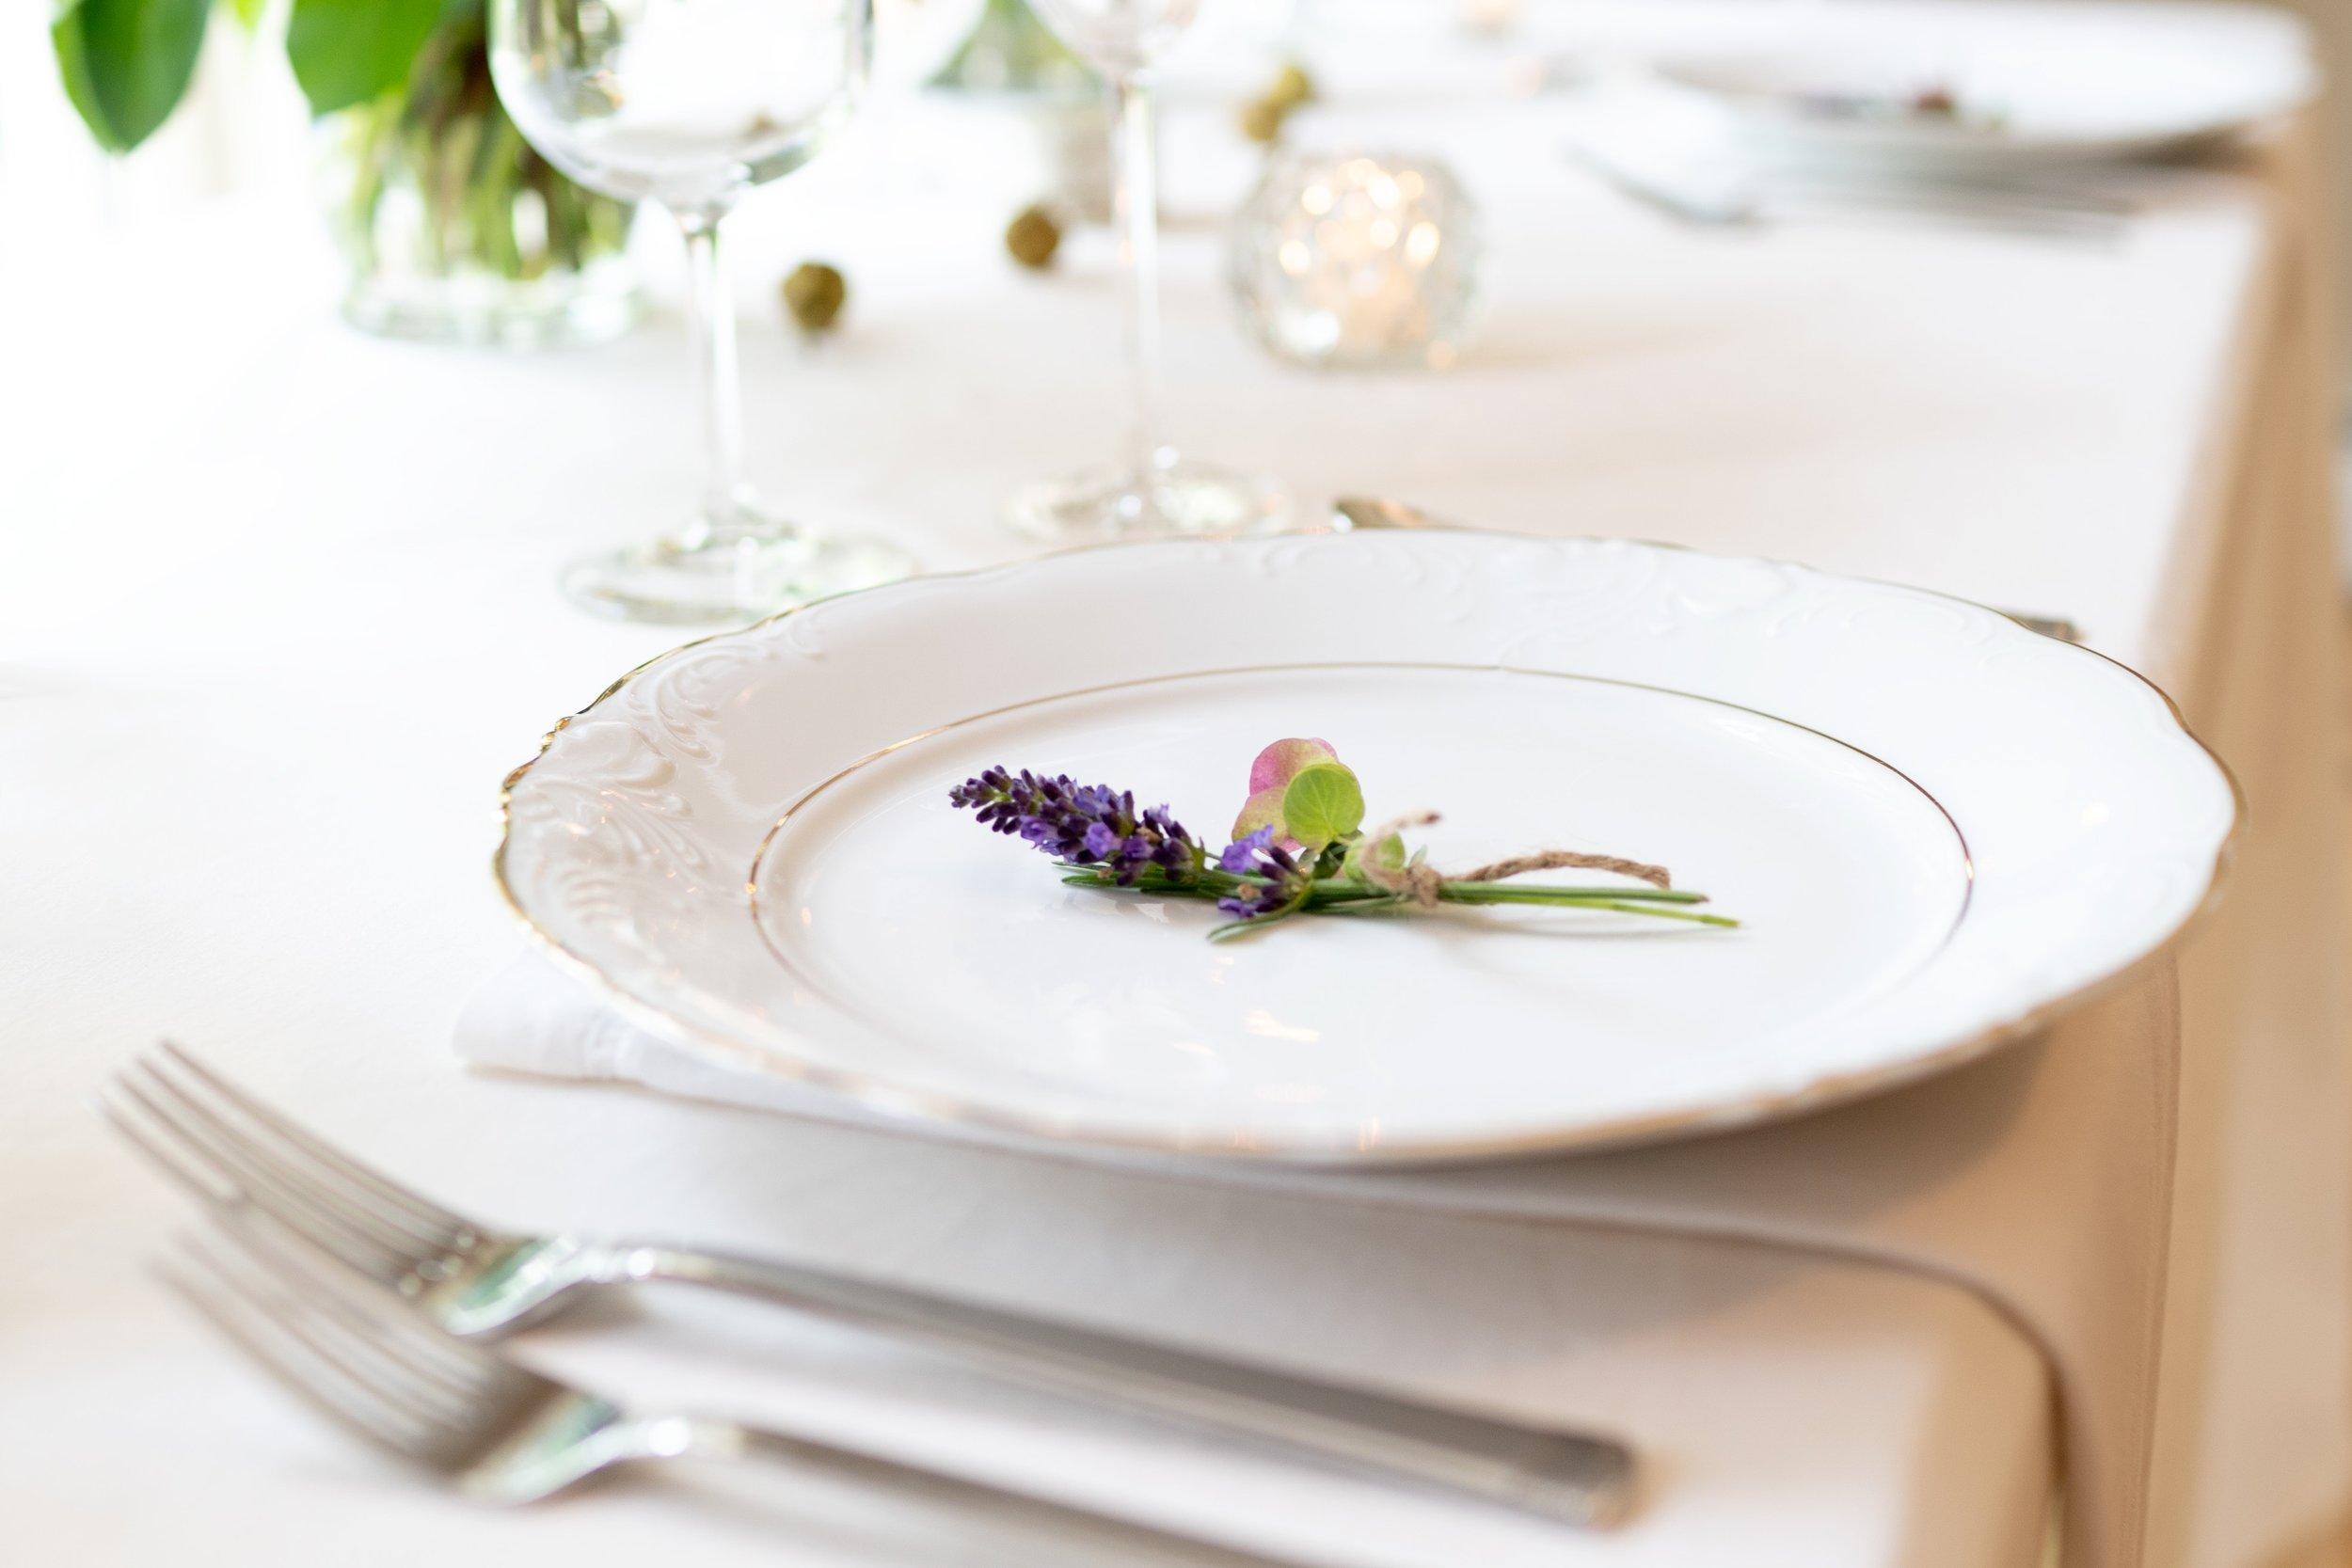 blur-close-up-cutlery-1428393.jpg